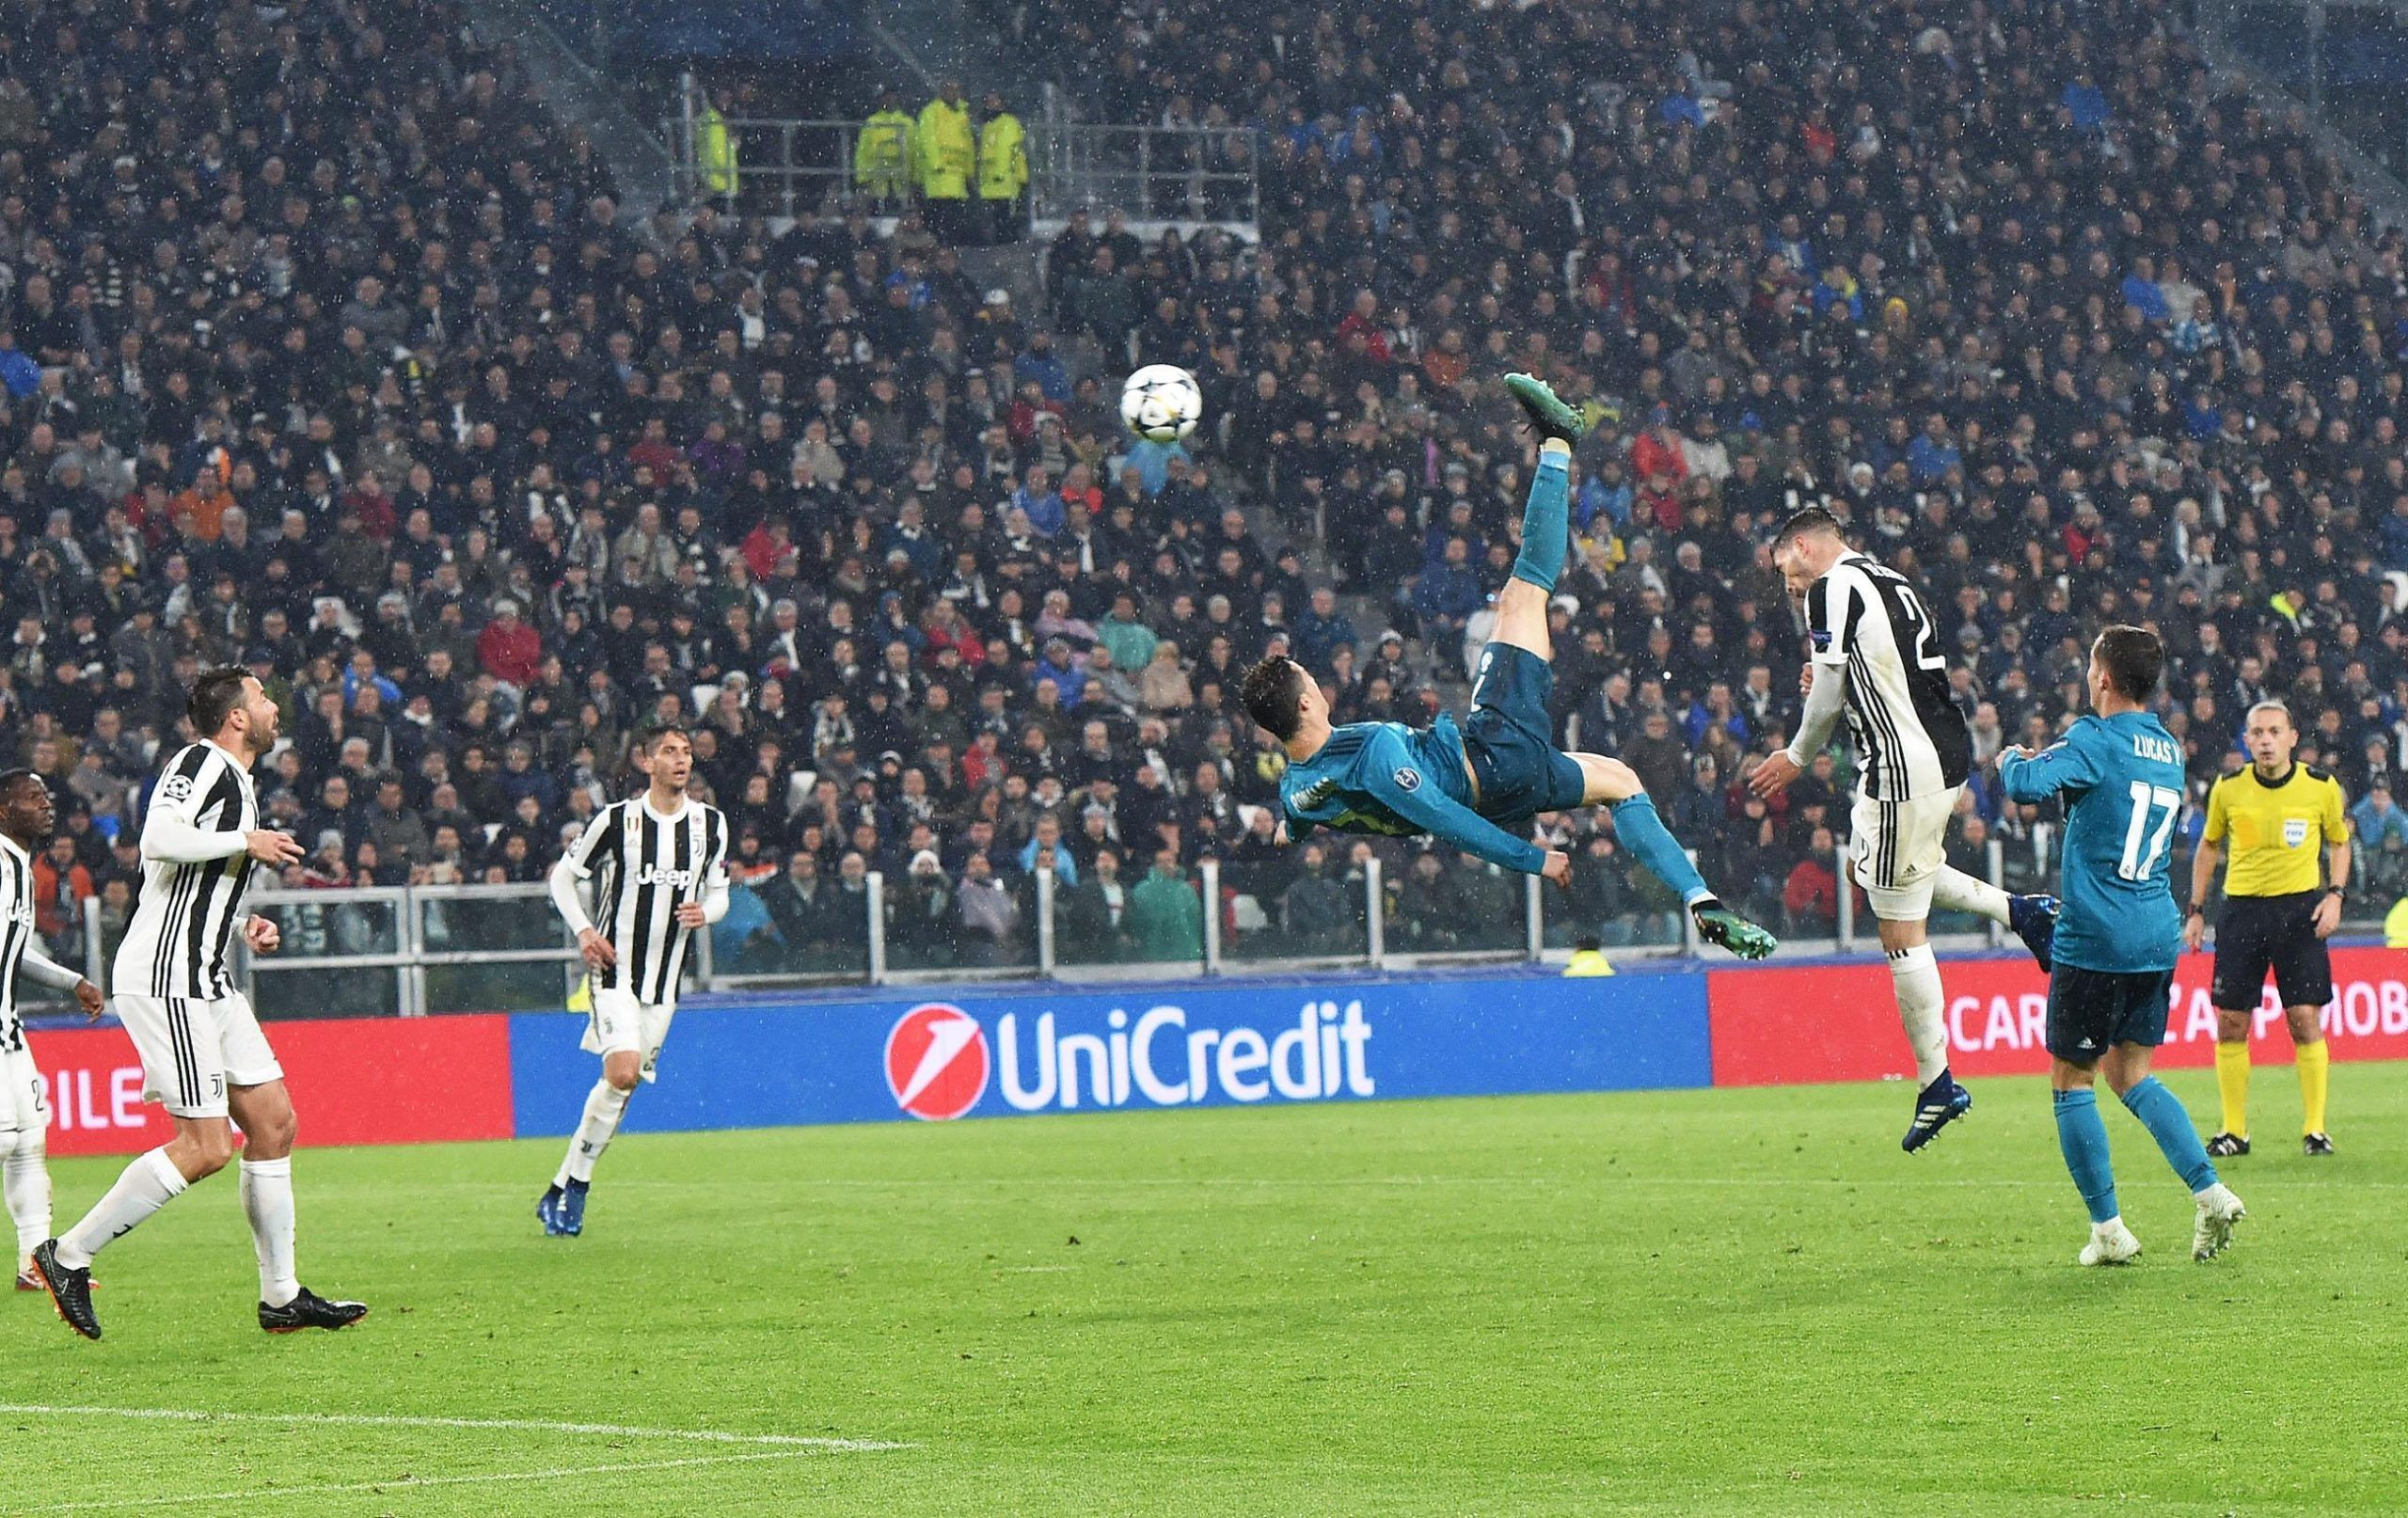 Rovesciata Ronaldo